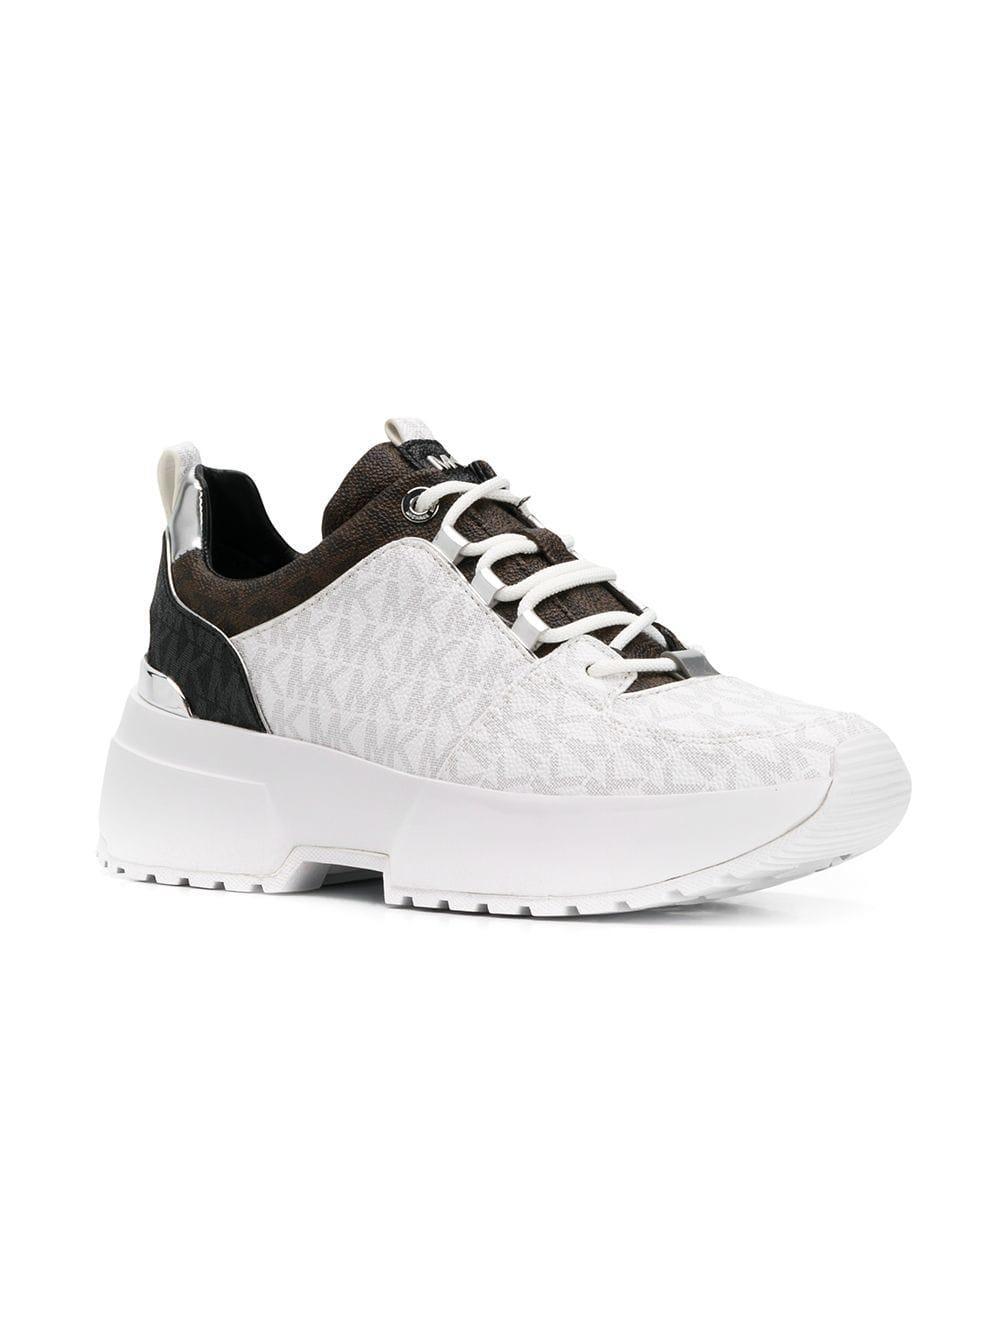 d1ed0a03d8f MICHAEL Michael Kors Monogram Print Sneakers in White - Lyst